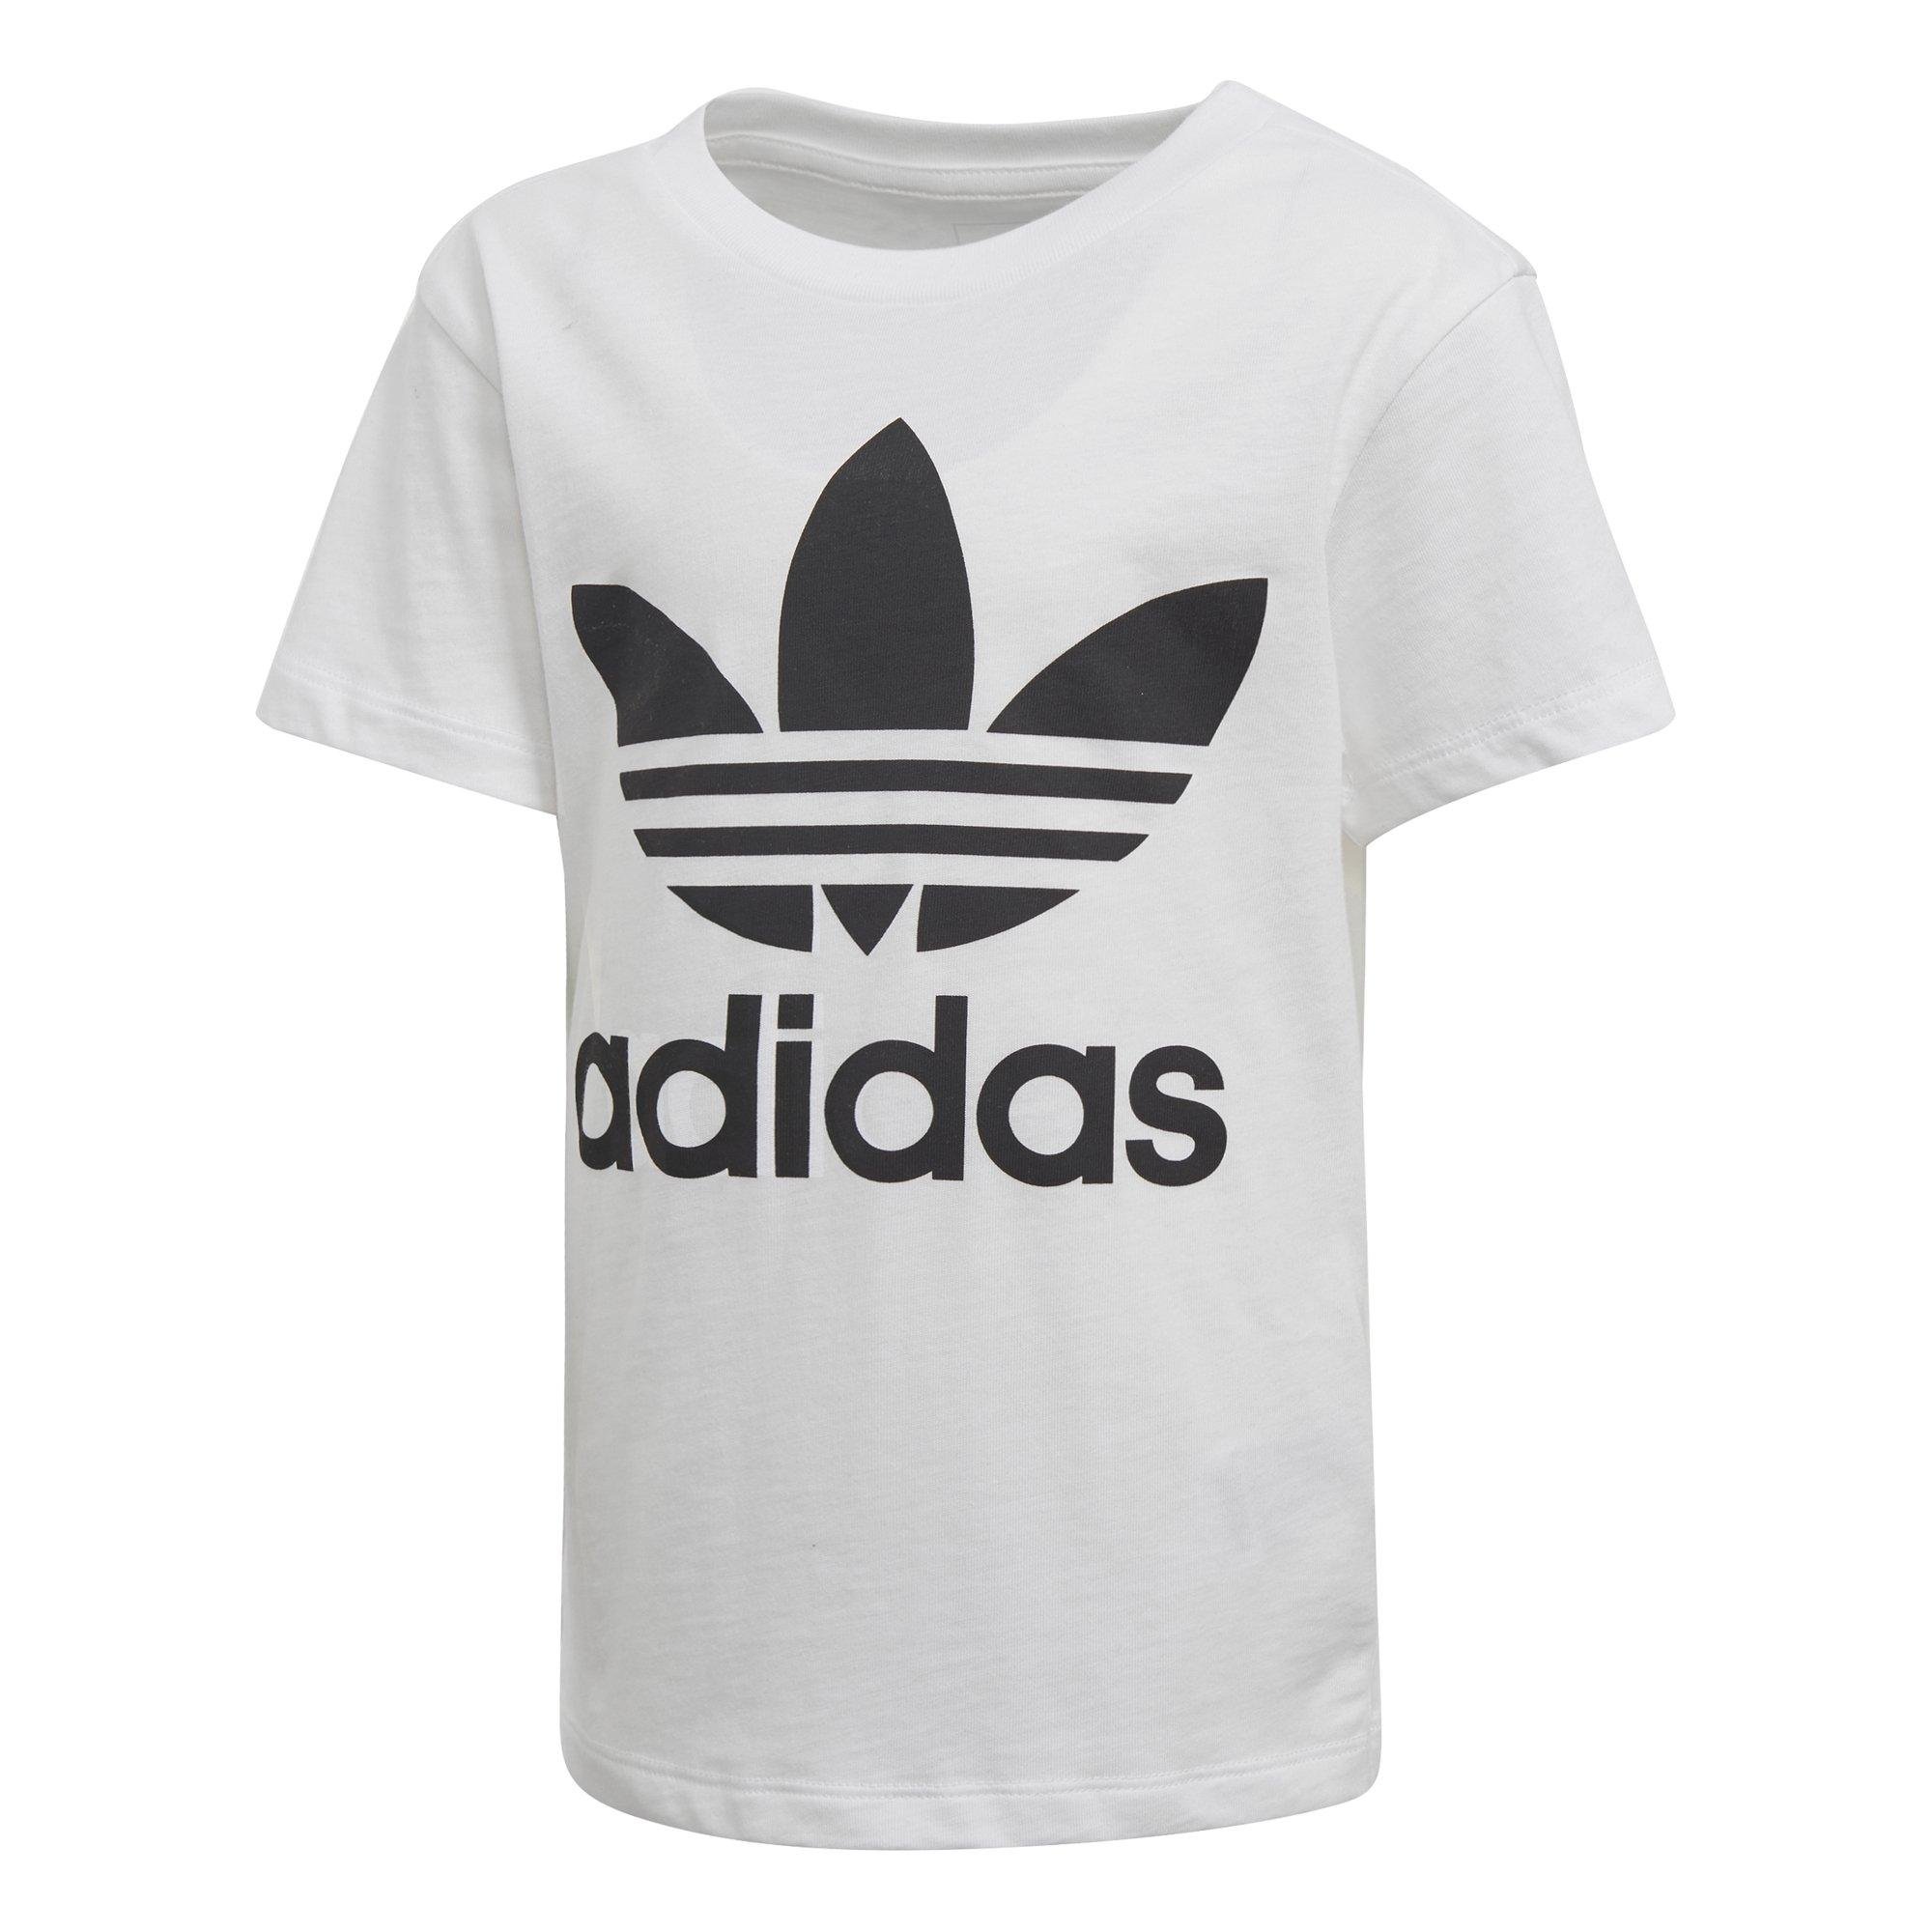 adidas Originals Big Boys' Trefoil Tee, White/Black, M